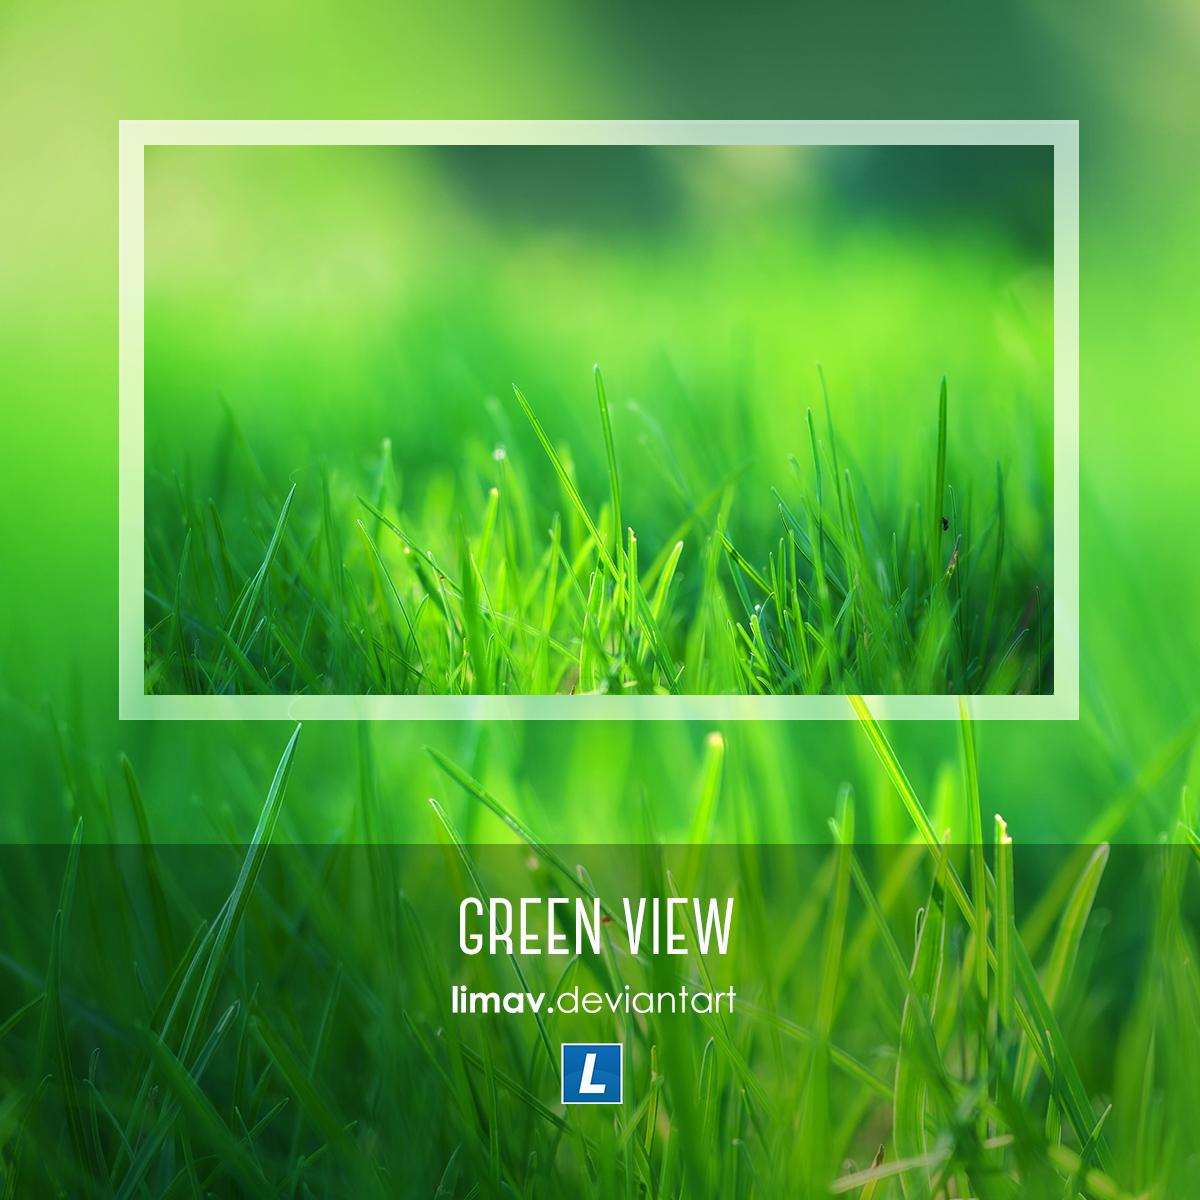 Green View - Wallpaper by limav